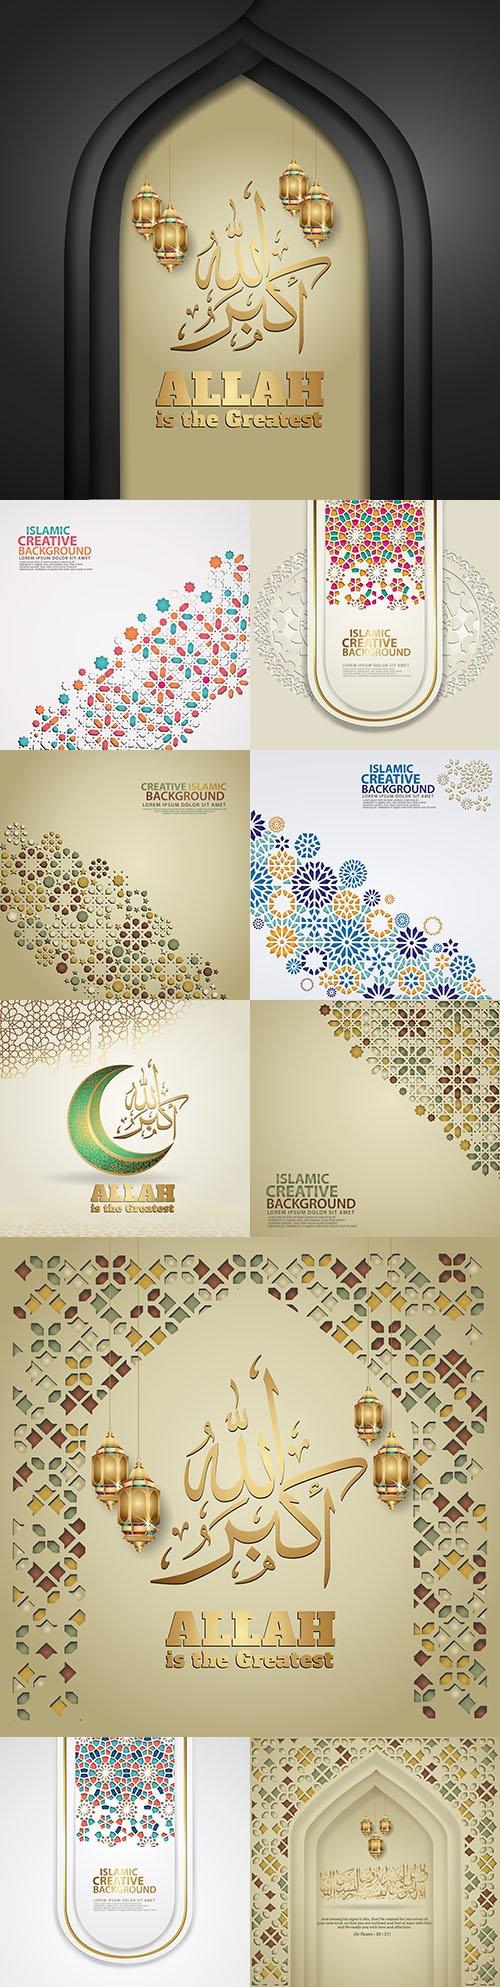 Elegant Islamic creative background with decorative colourful mosaic